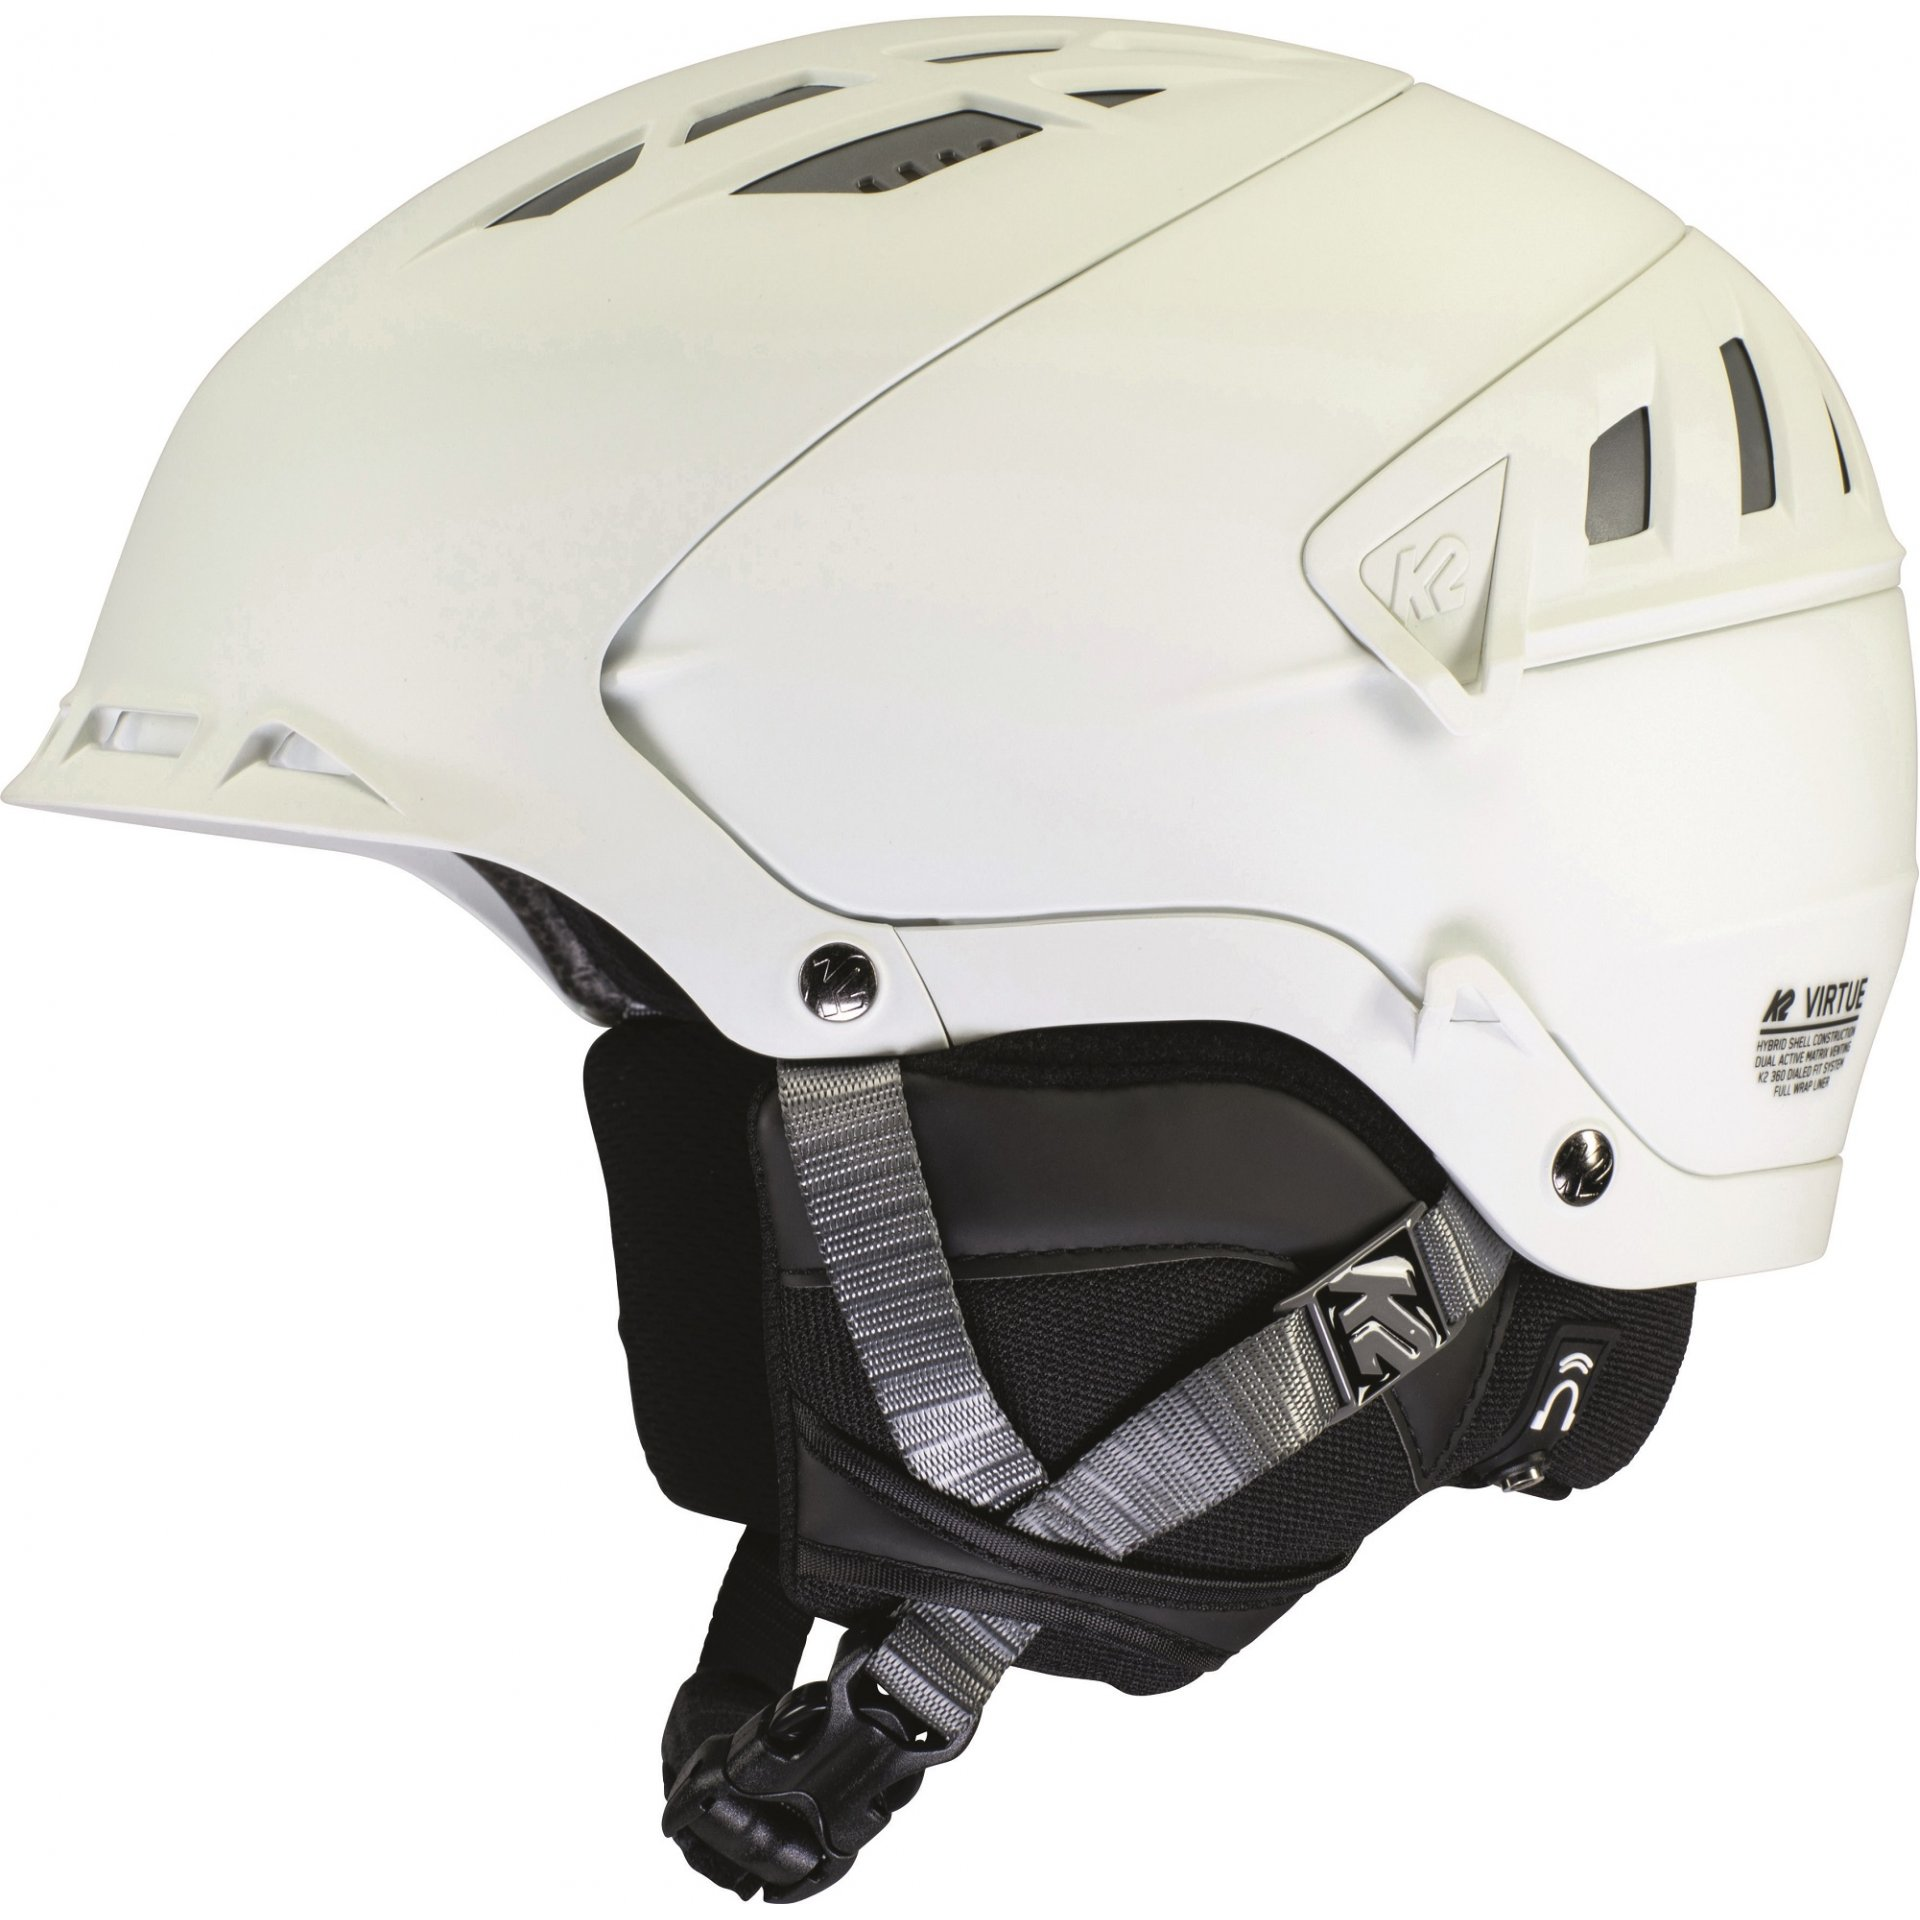 KASK K2 VIRTUE 10E4002|12 PEARL WHITE